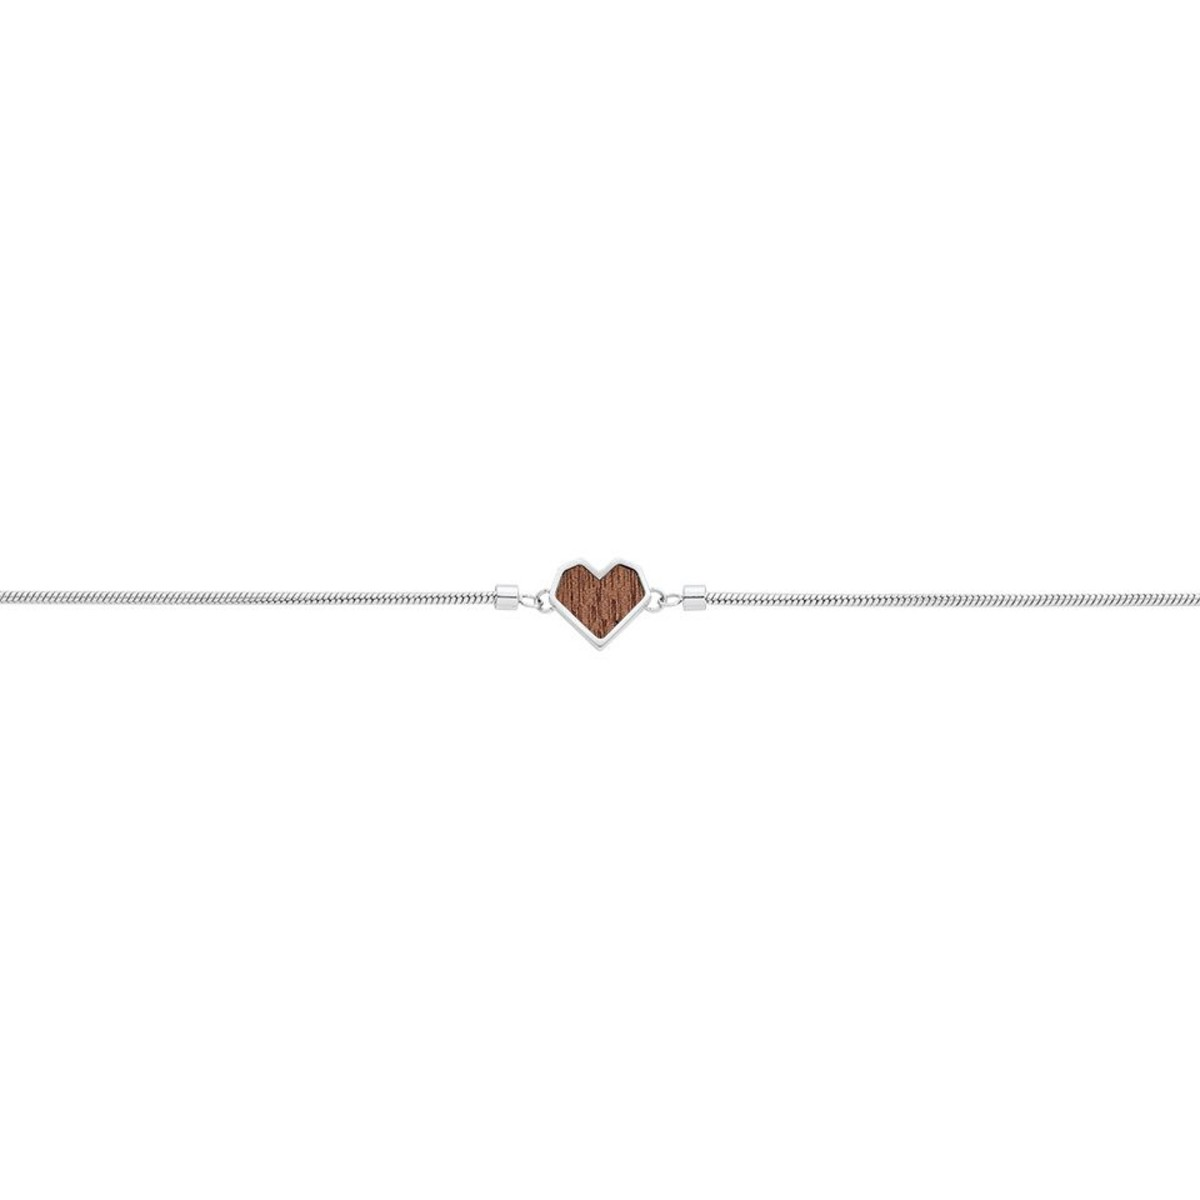 "Armband mit Holzdetail - Motiv Herz - ""Red Bracelet Heart"""